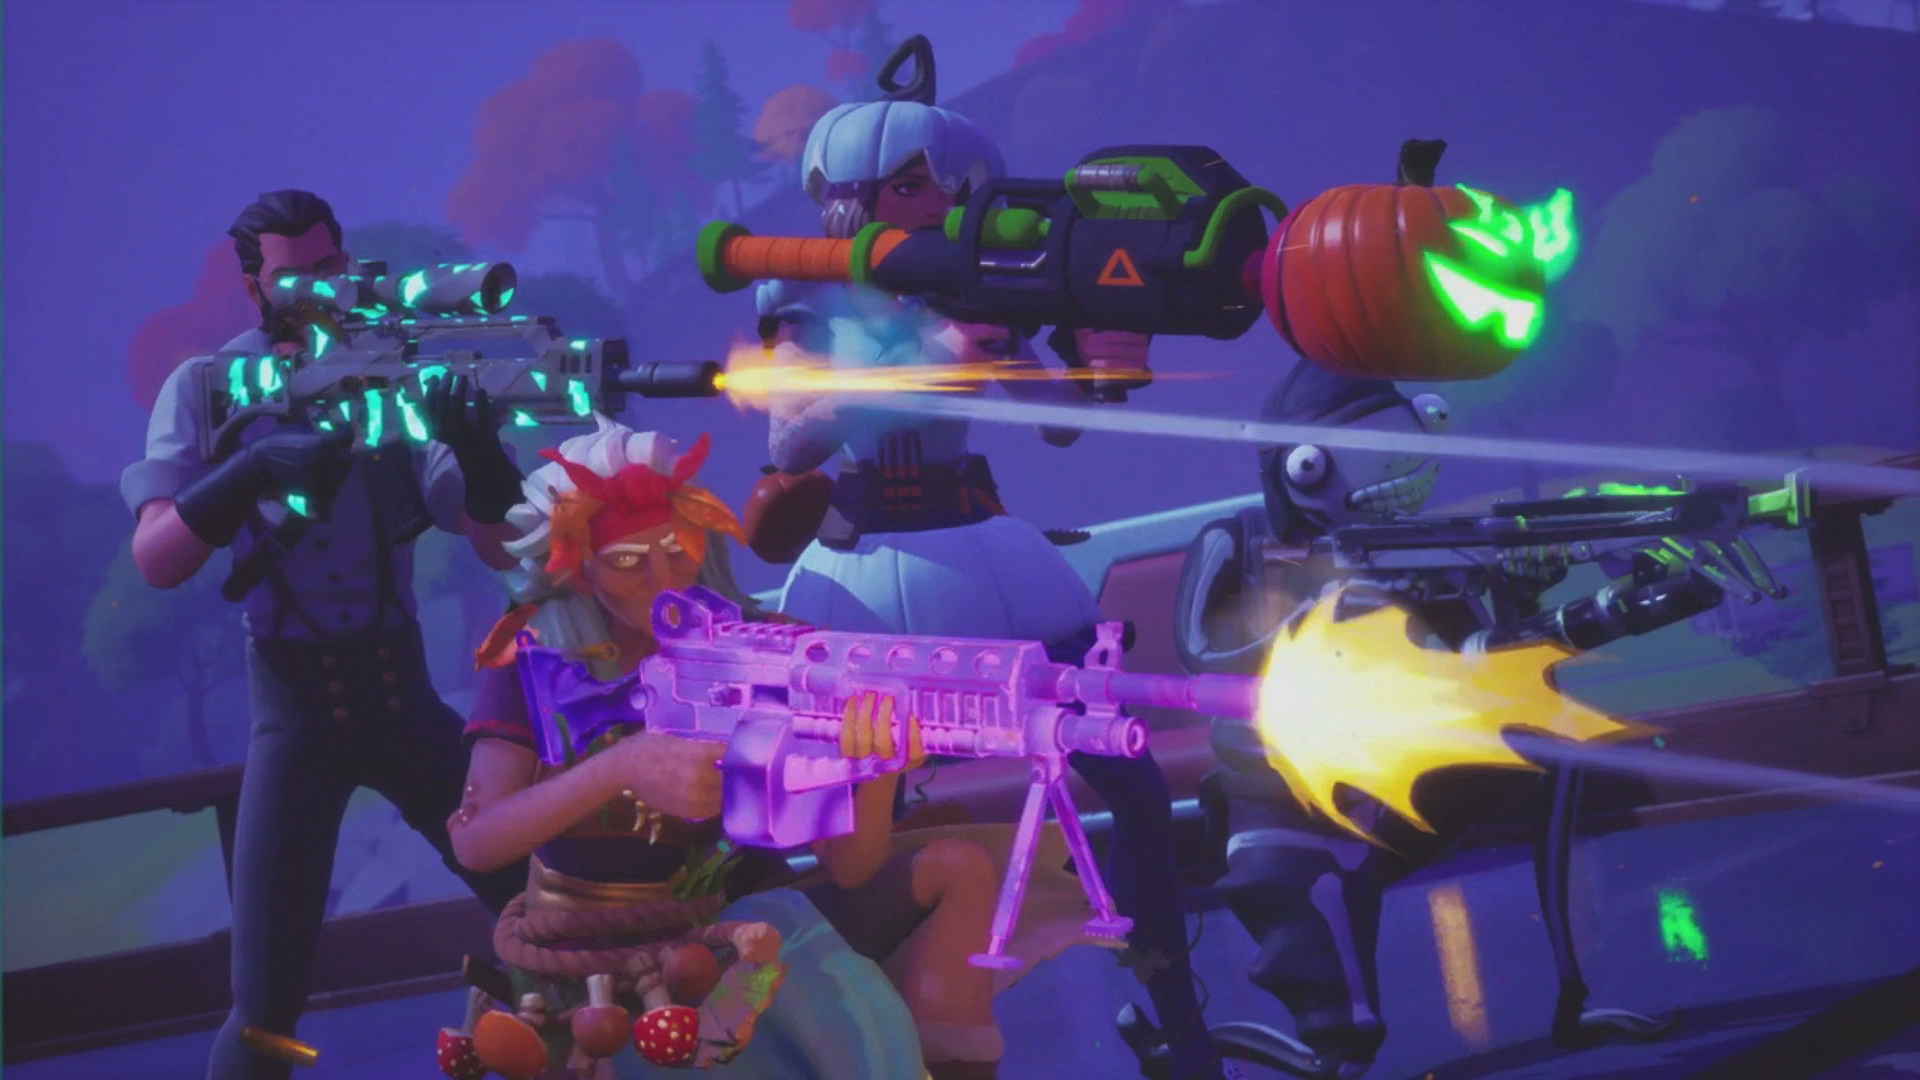 Fortnite Fortnitemares Challenges 2020 How To Complete Them And Earn Fortnitemares Rewards Gamesradar